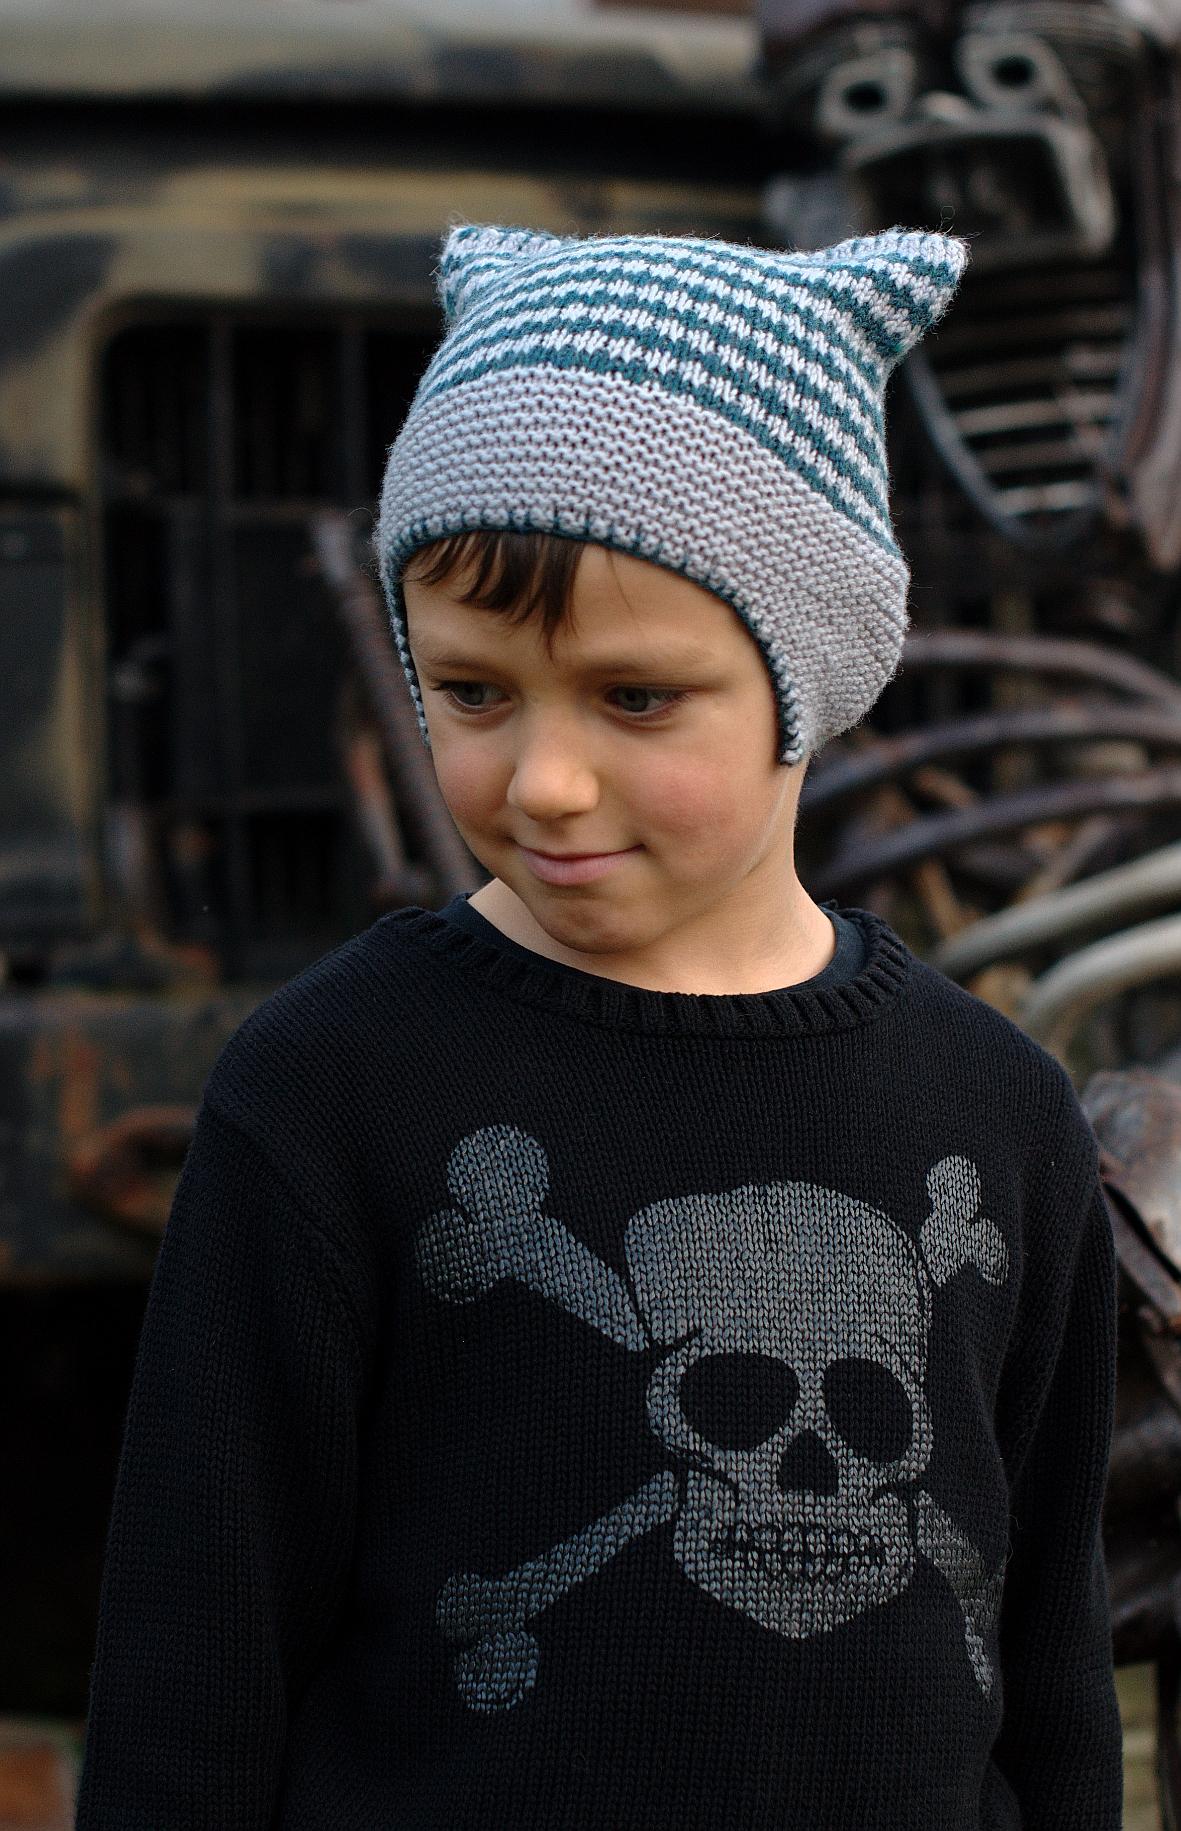 Pinion skater style chullo Hat knitting pattern